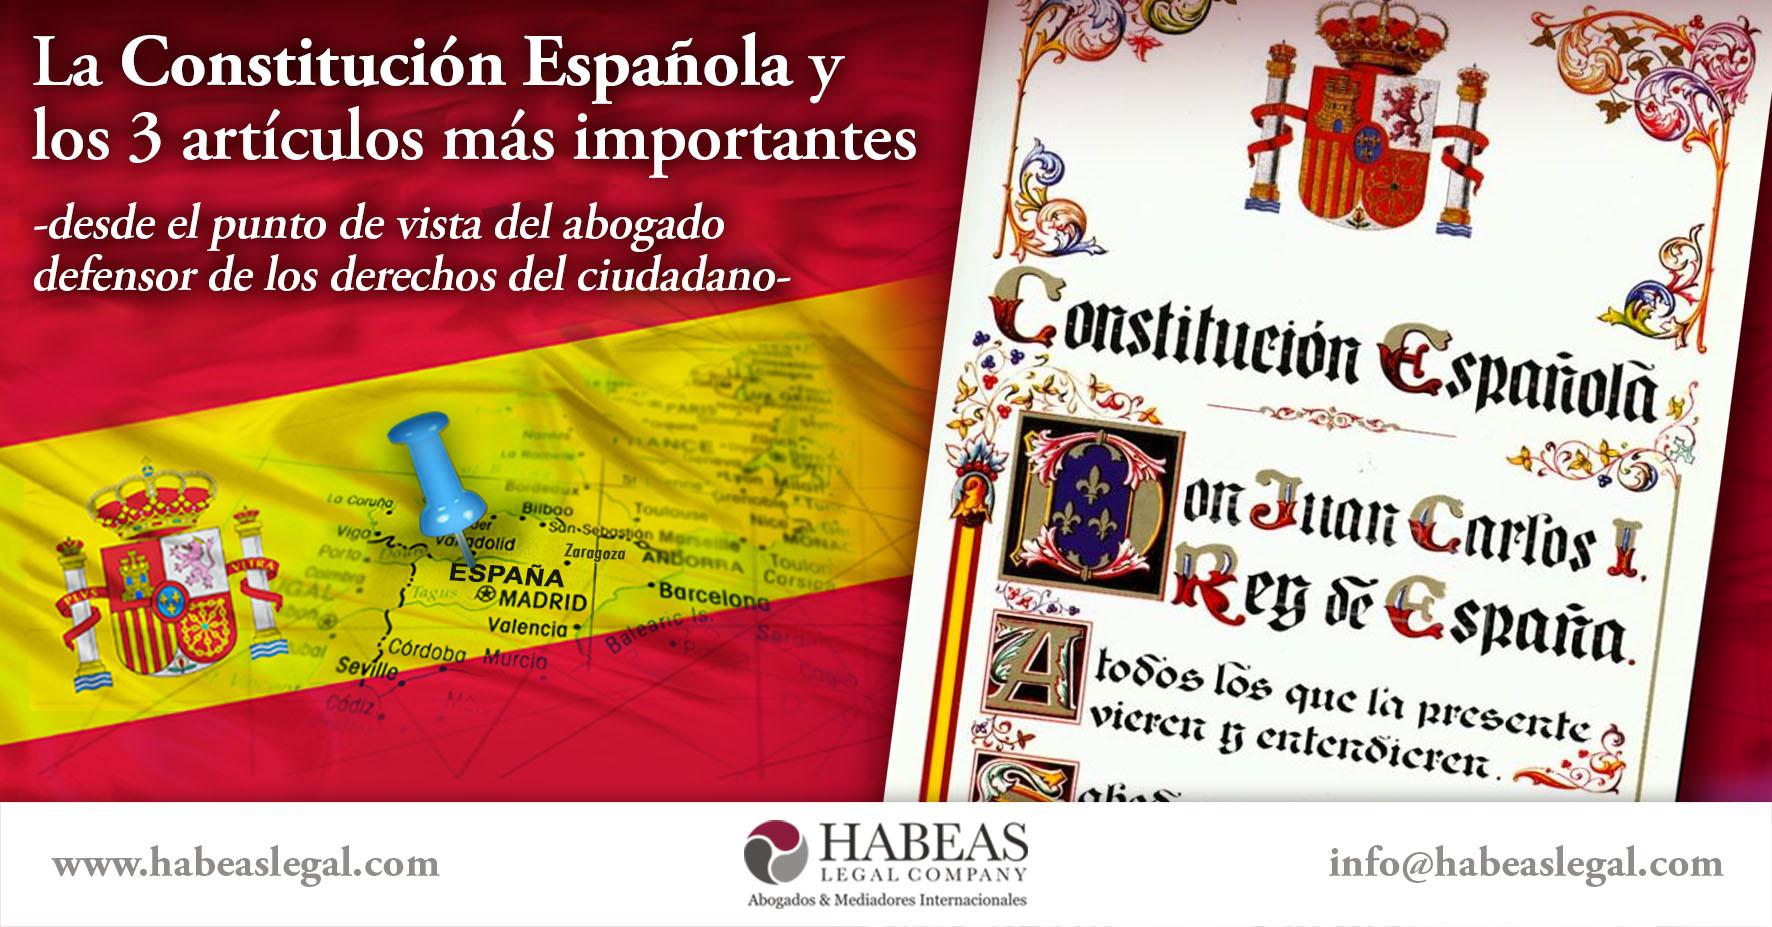 Constitución Española Habeas - Blog